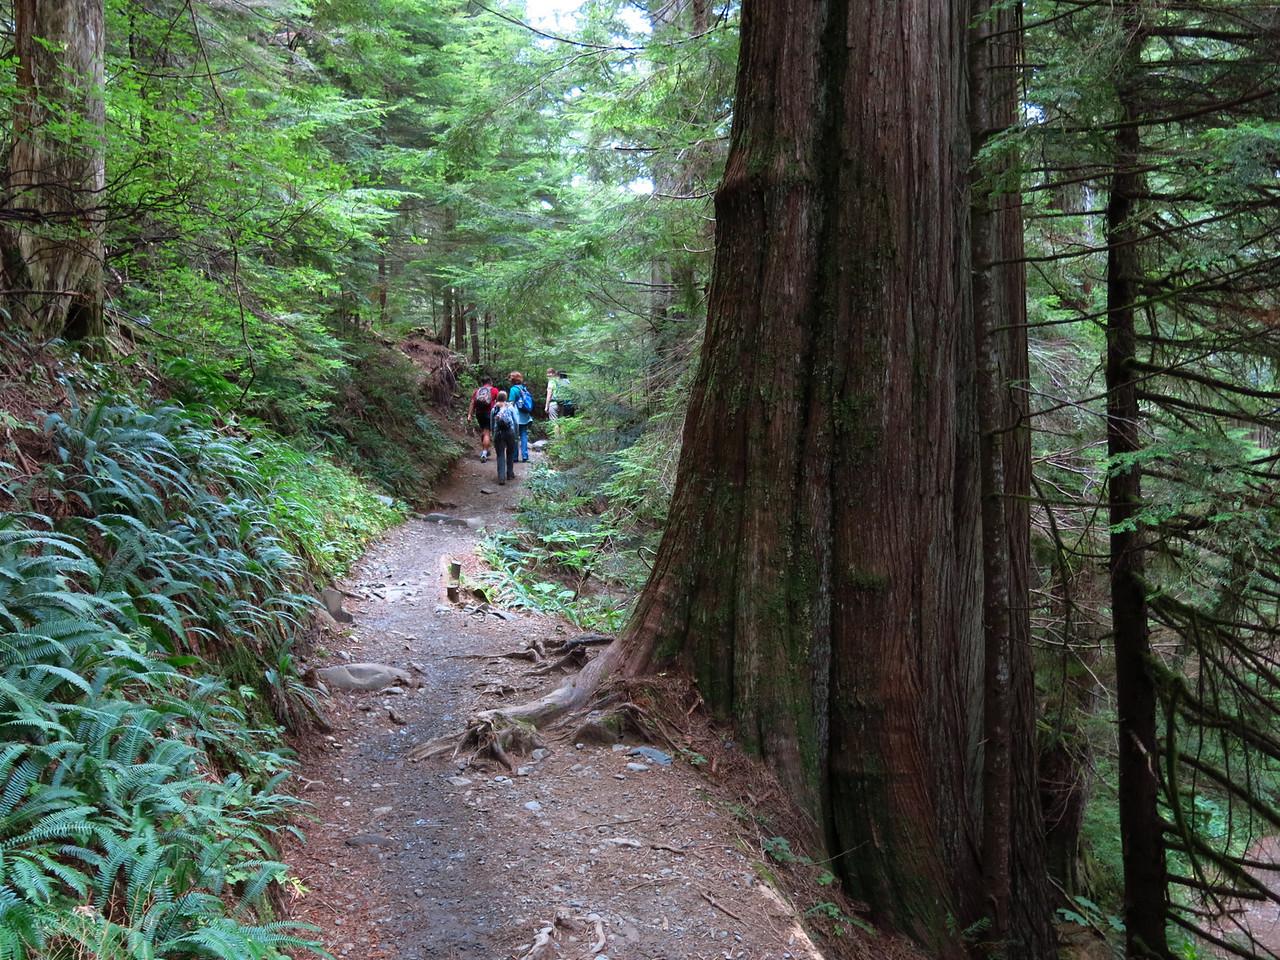 Another gargantuan tree trunk dwarfs the homo sapiens on the trail.